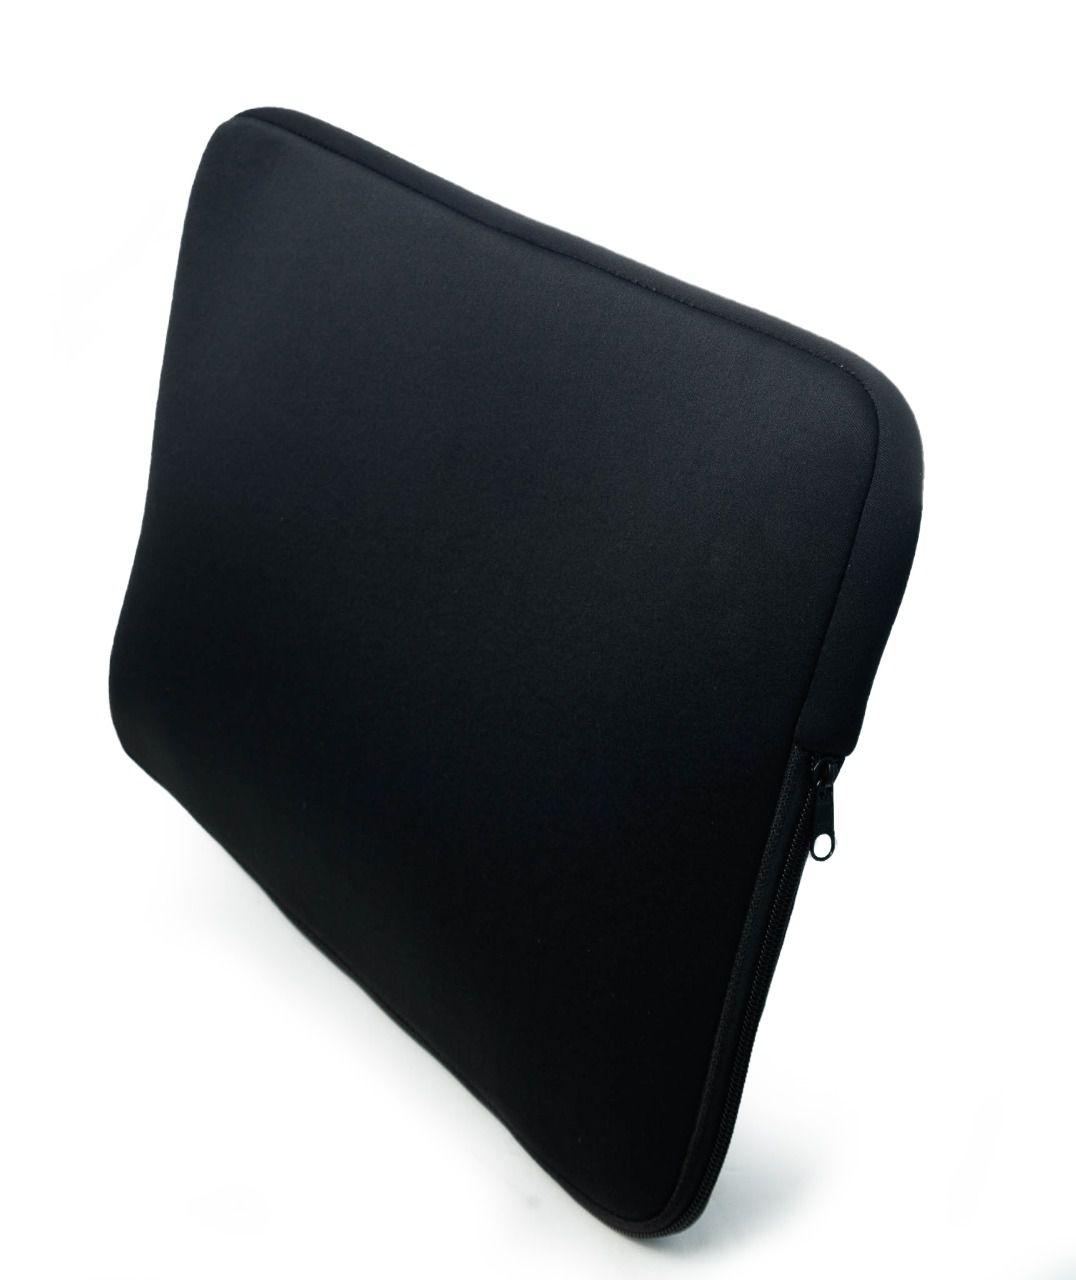 Luva Capa Case 15,6 Polegadas Preta para Notebook Ultrabook  -  Mothelucci Loja online